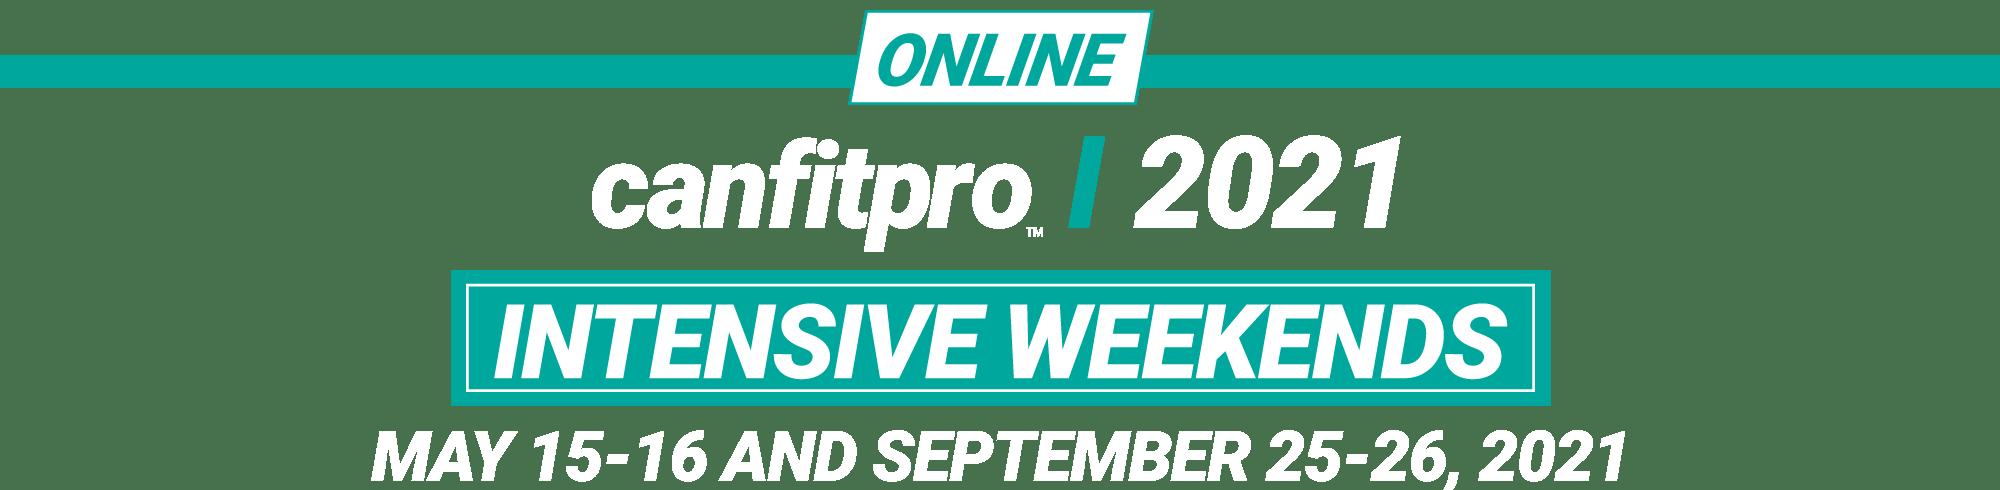 canfitpro intensive weekend logo